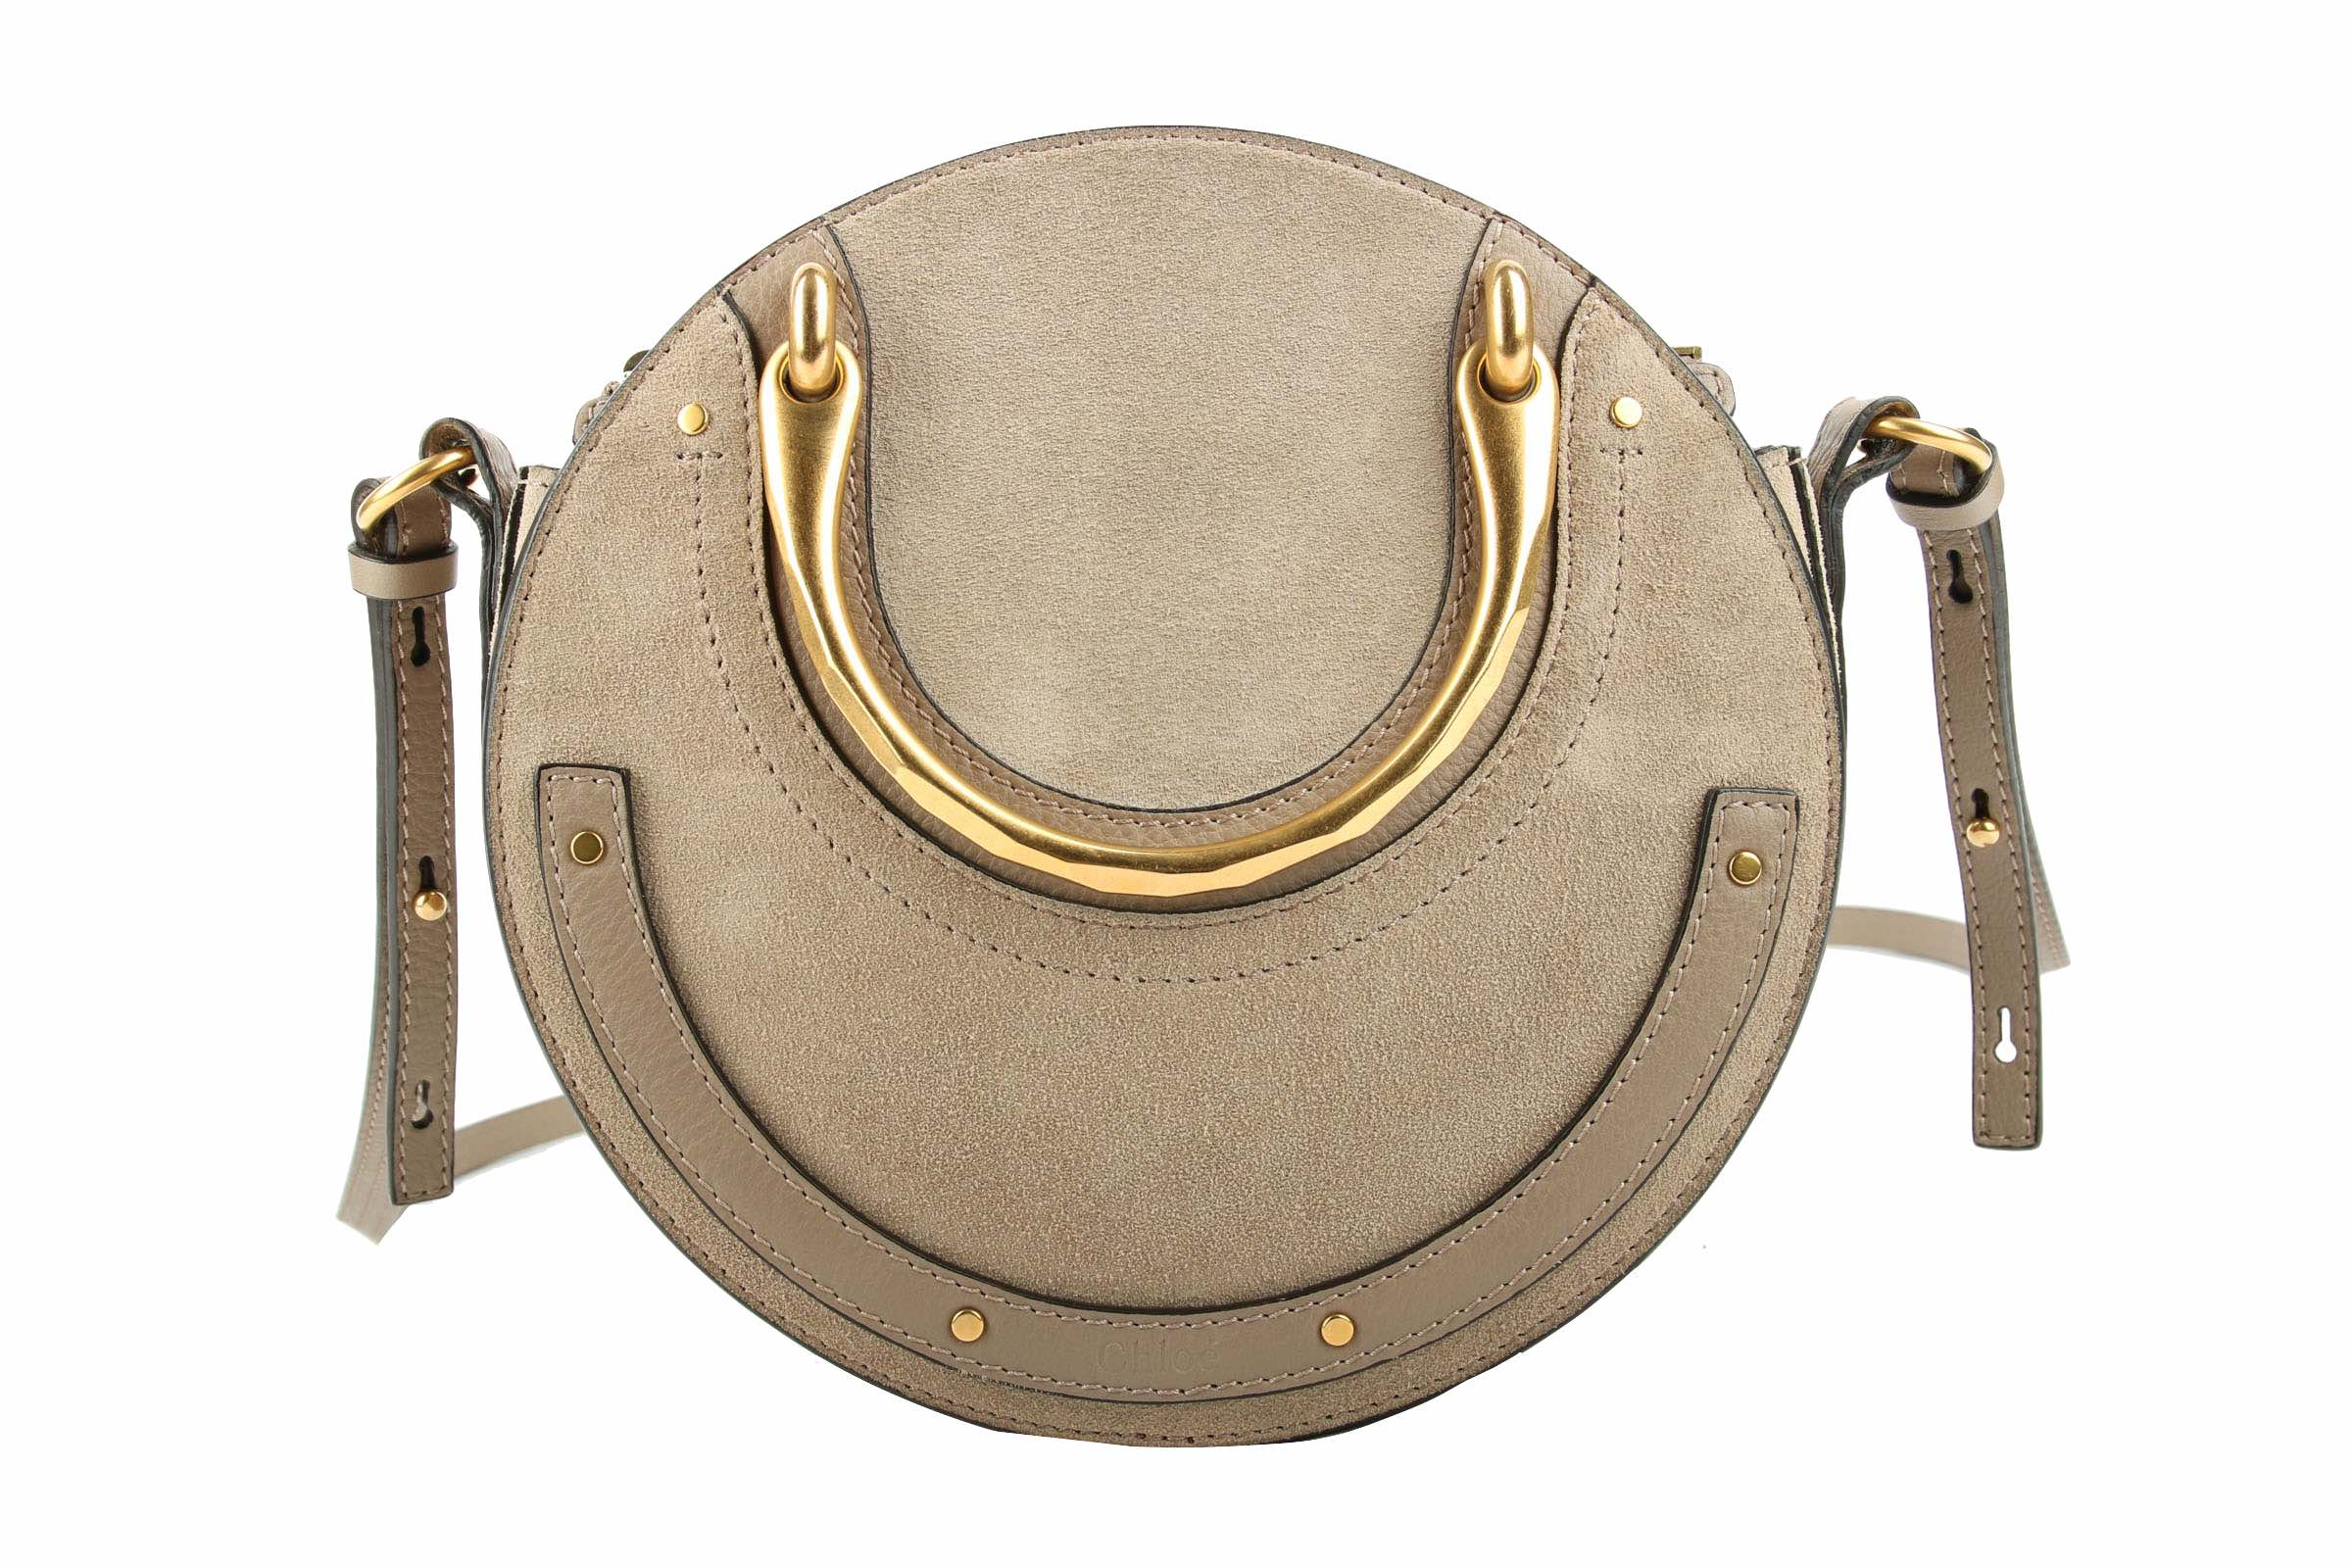 1f316c005c1e0 Second Hand Designer-Handtaschen   -Accessoires